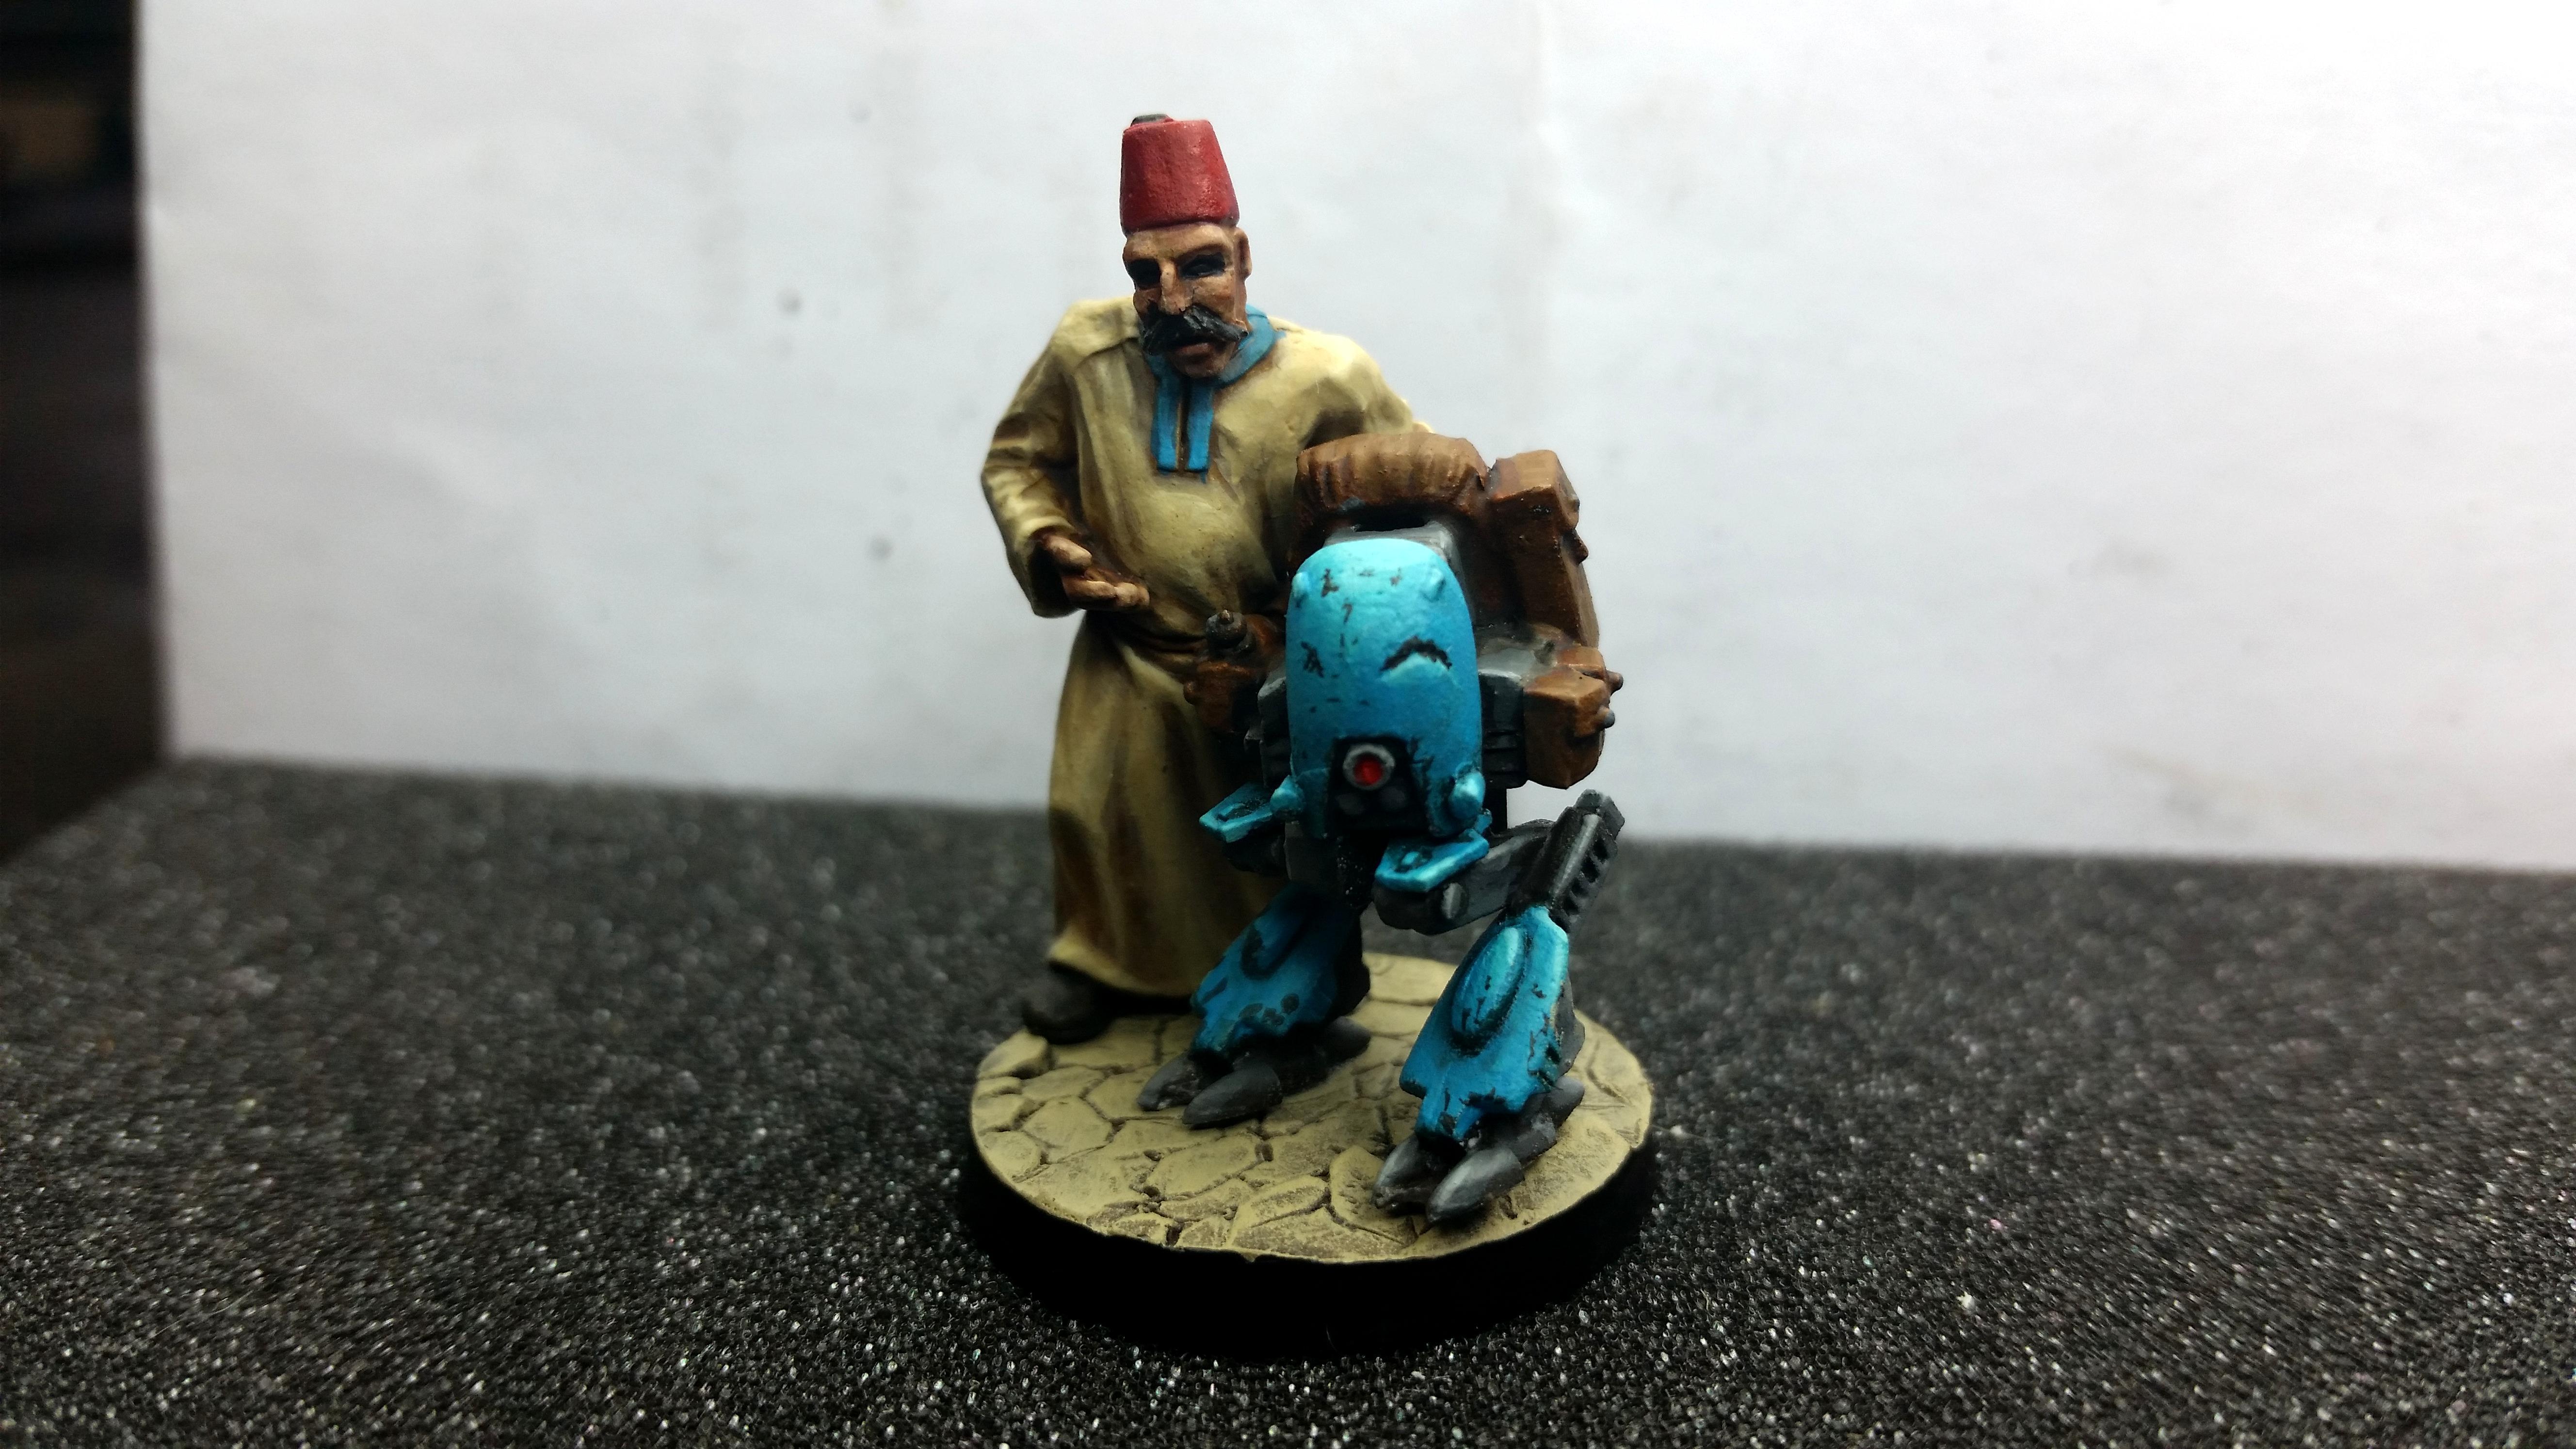 Arab, Merchant, Robot